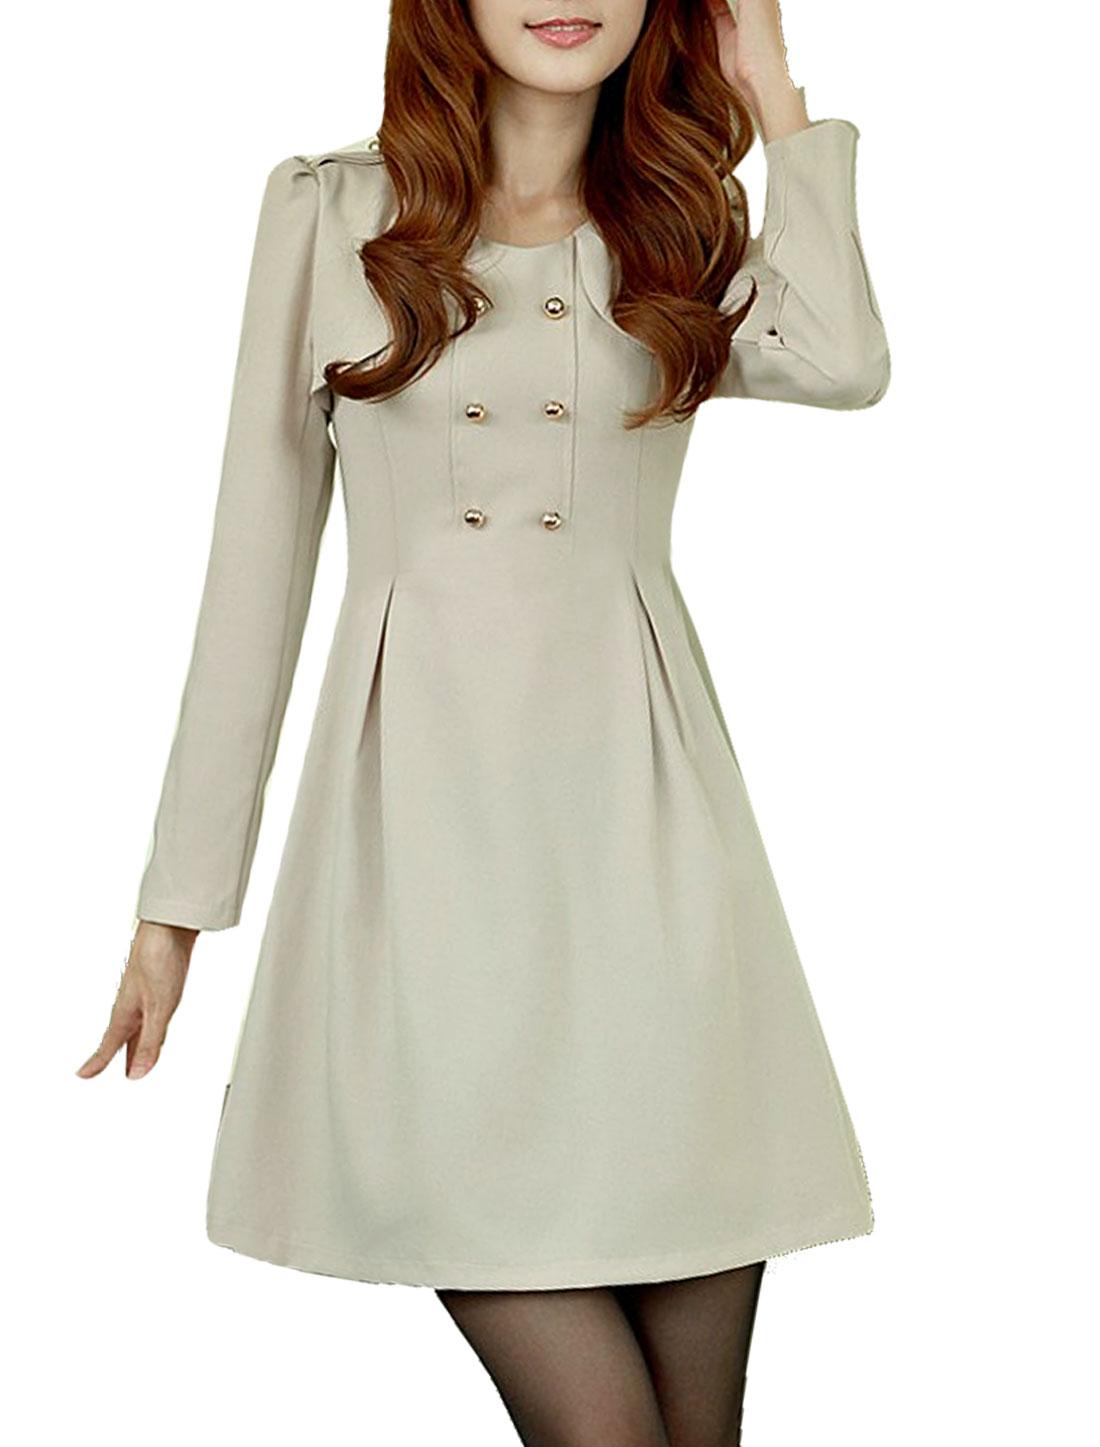 Autumn Scoop Neck Long Sleeve Ladies Apricot Dress XS